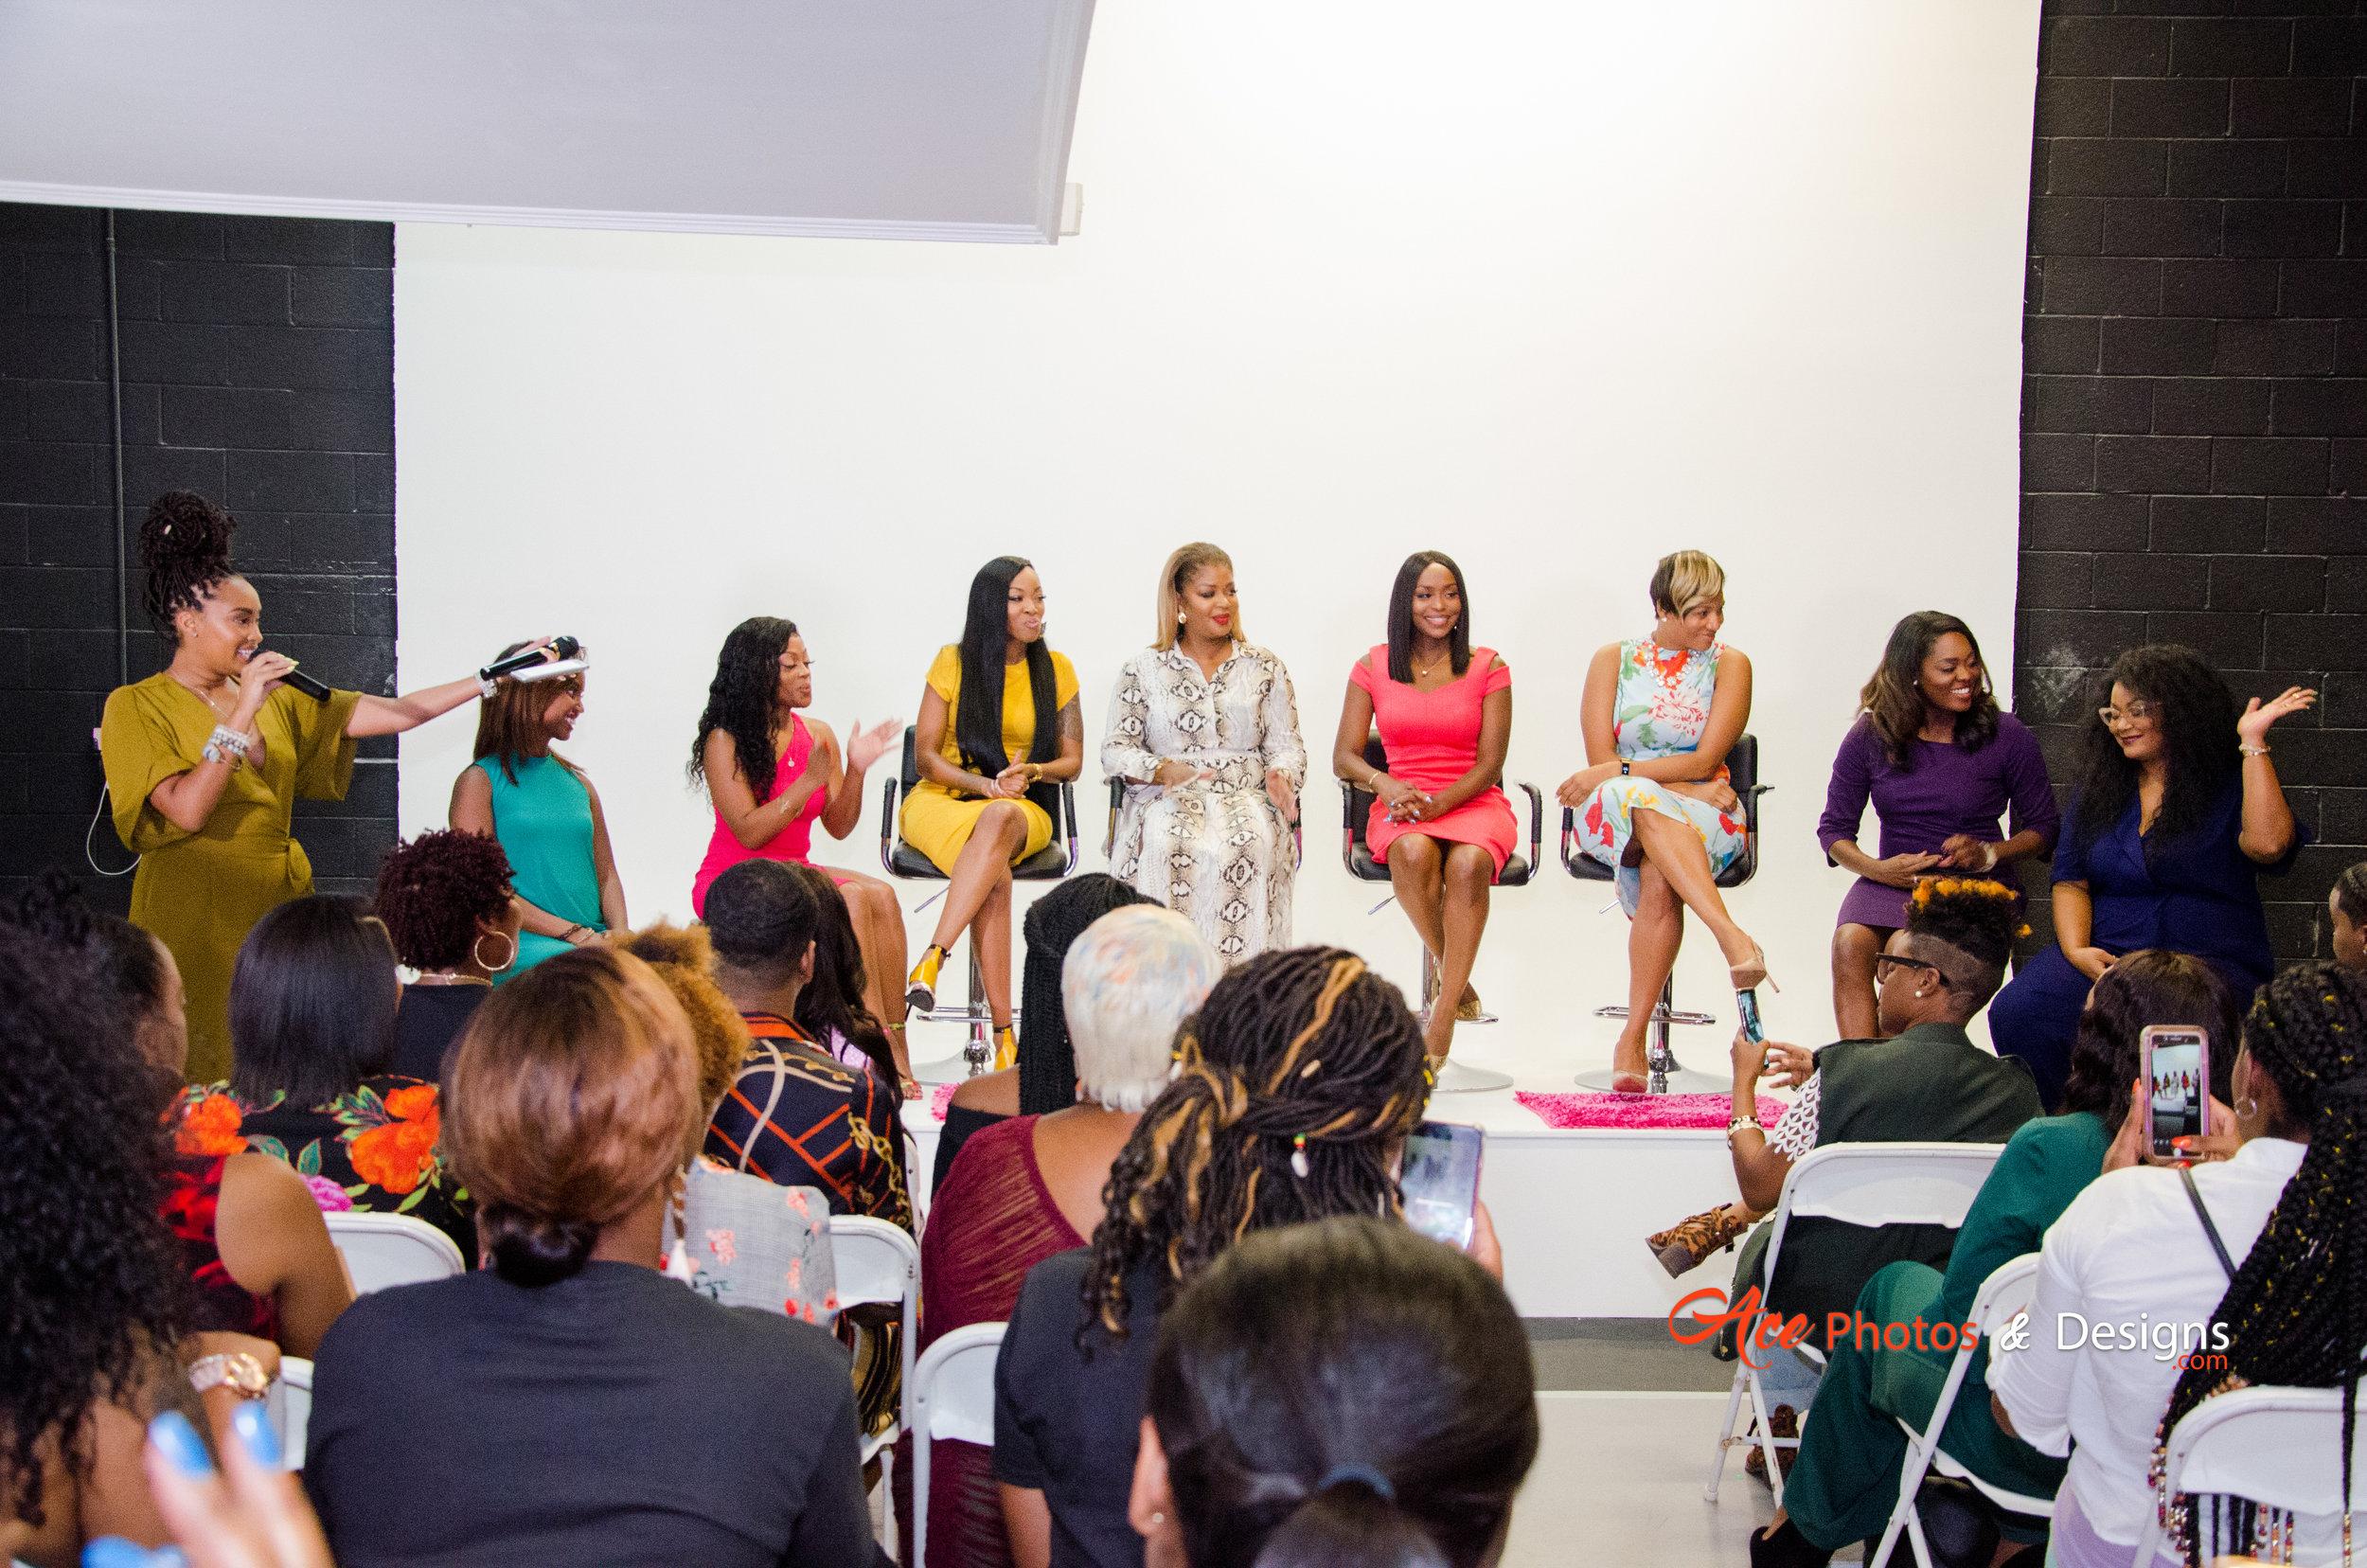 The Media Girls on Tour Atlanta Panelists. Photo cred: Ace Photos & Designs